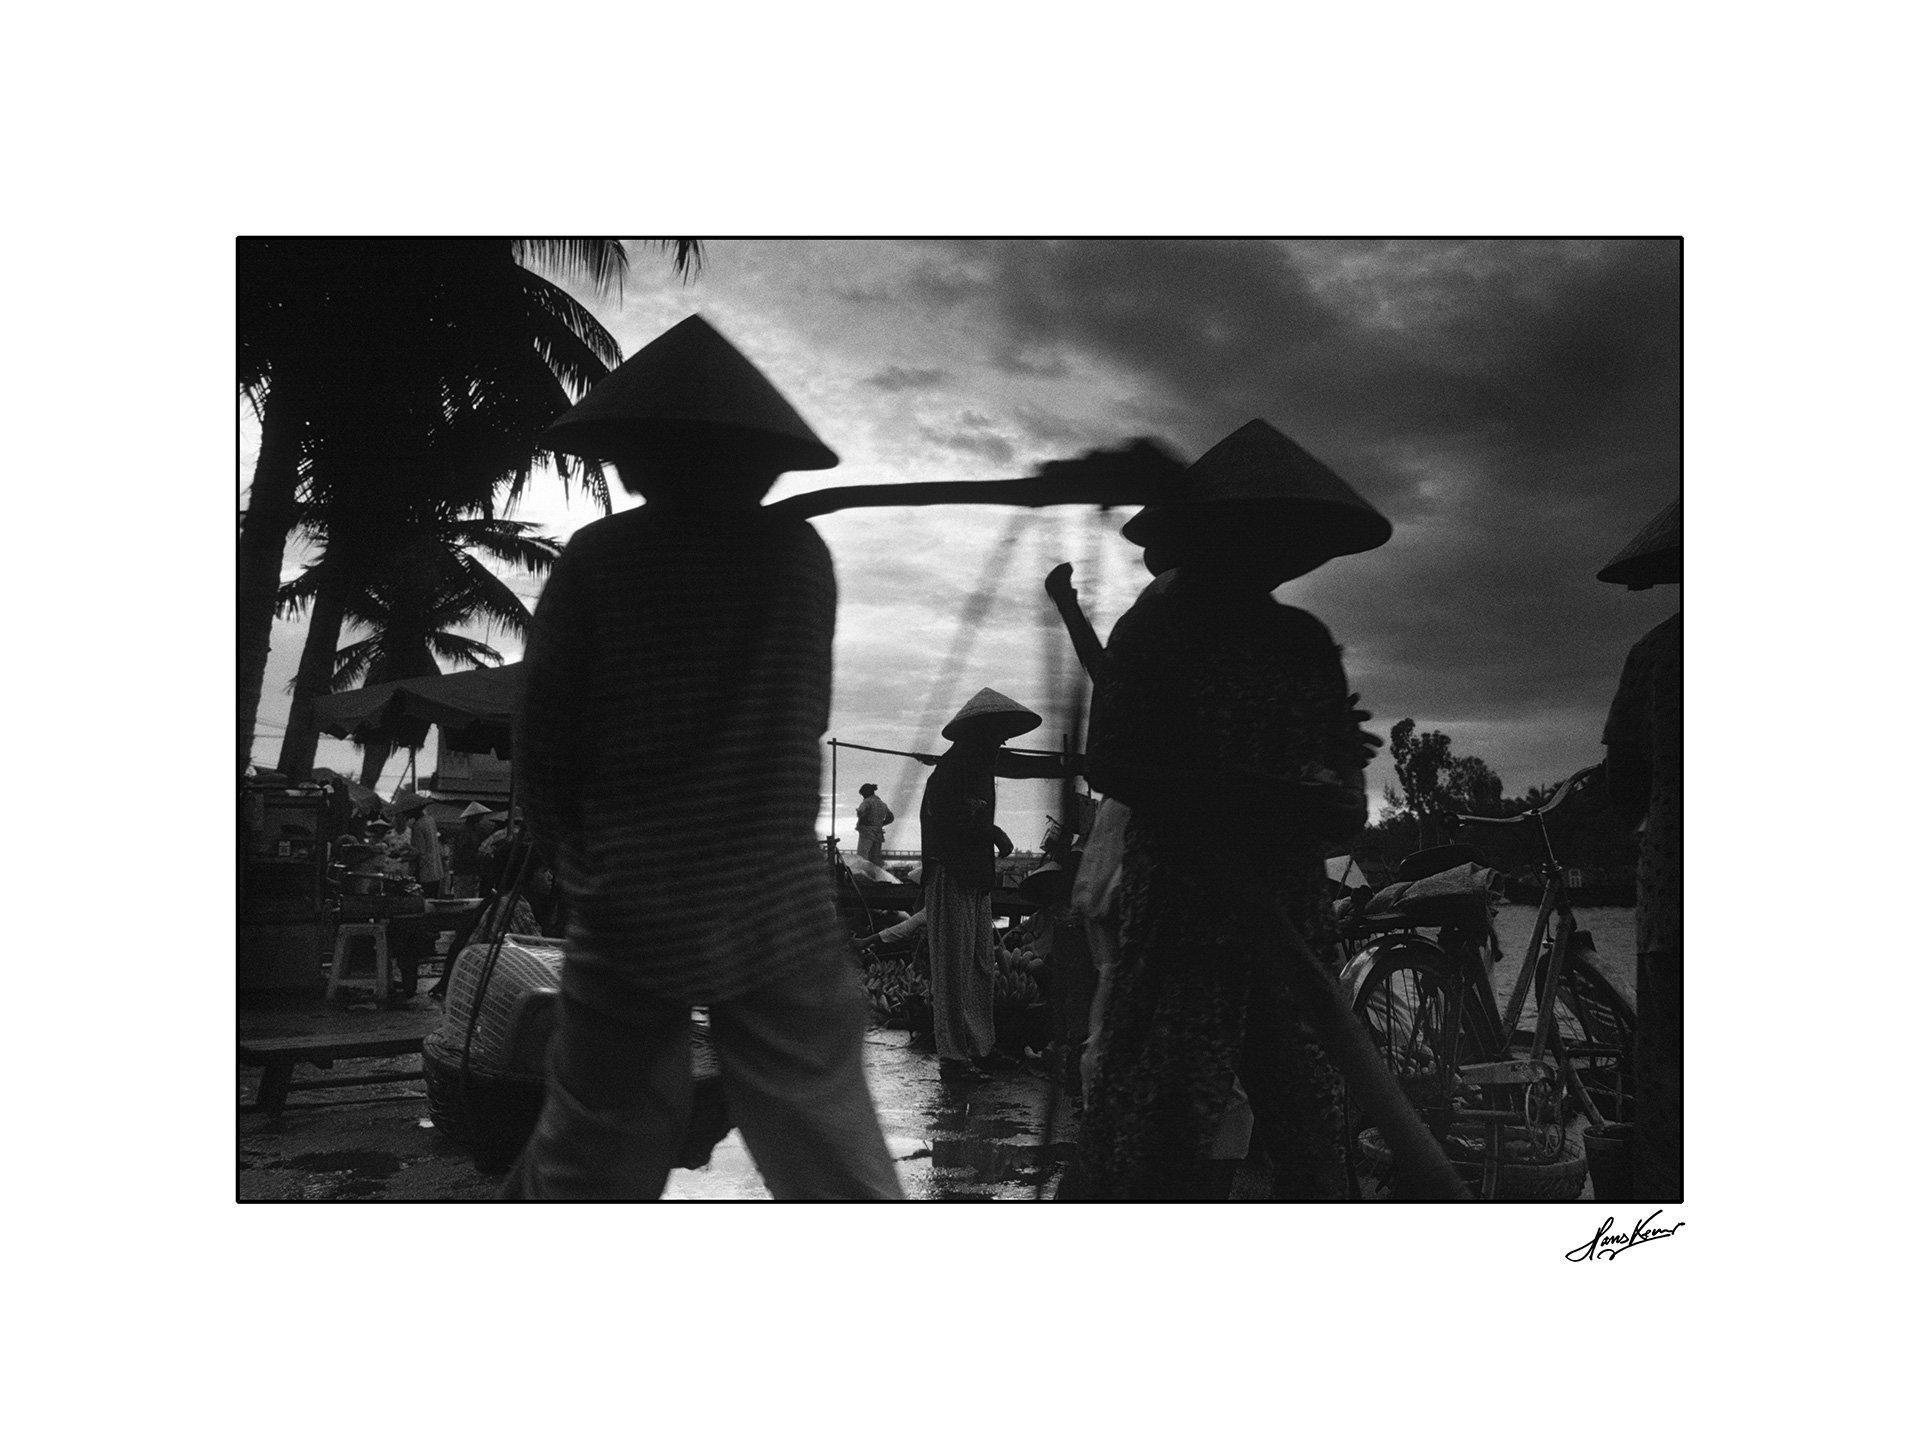 Vendor silhouettes, Hoi An, Vietnam, 1999